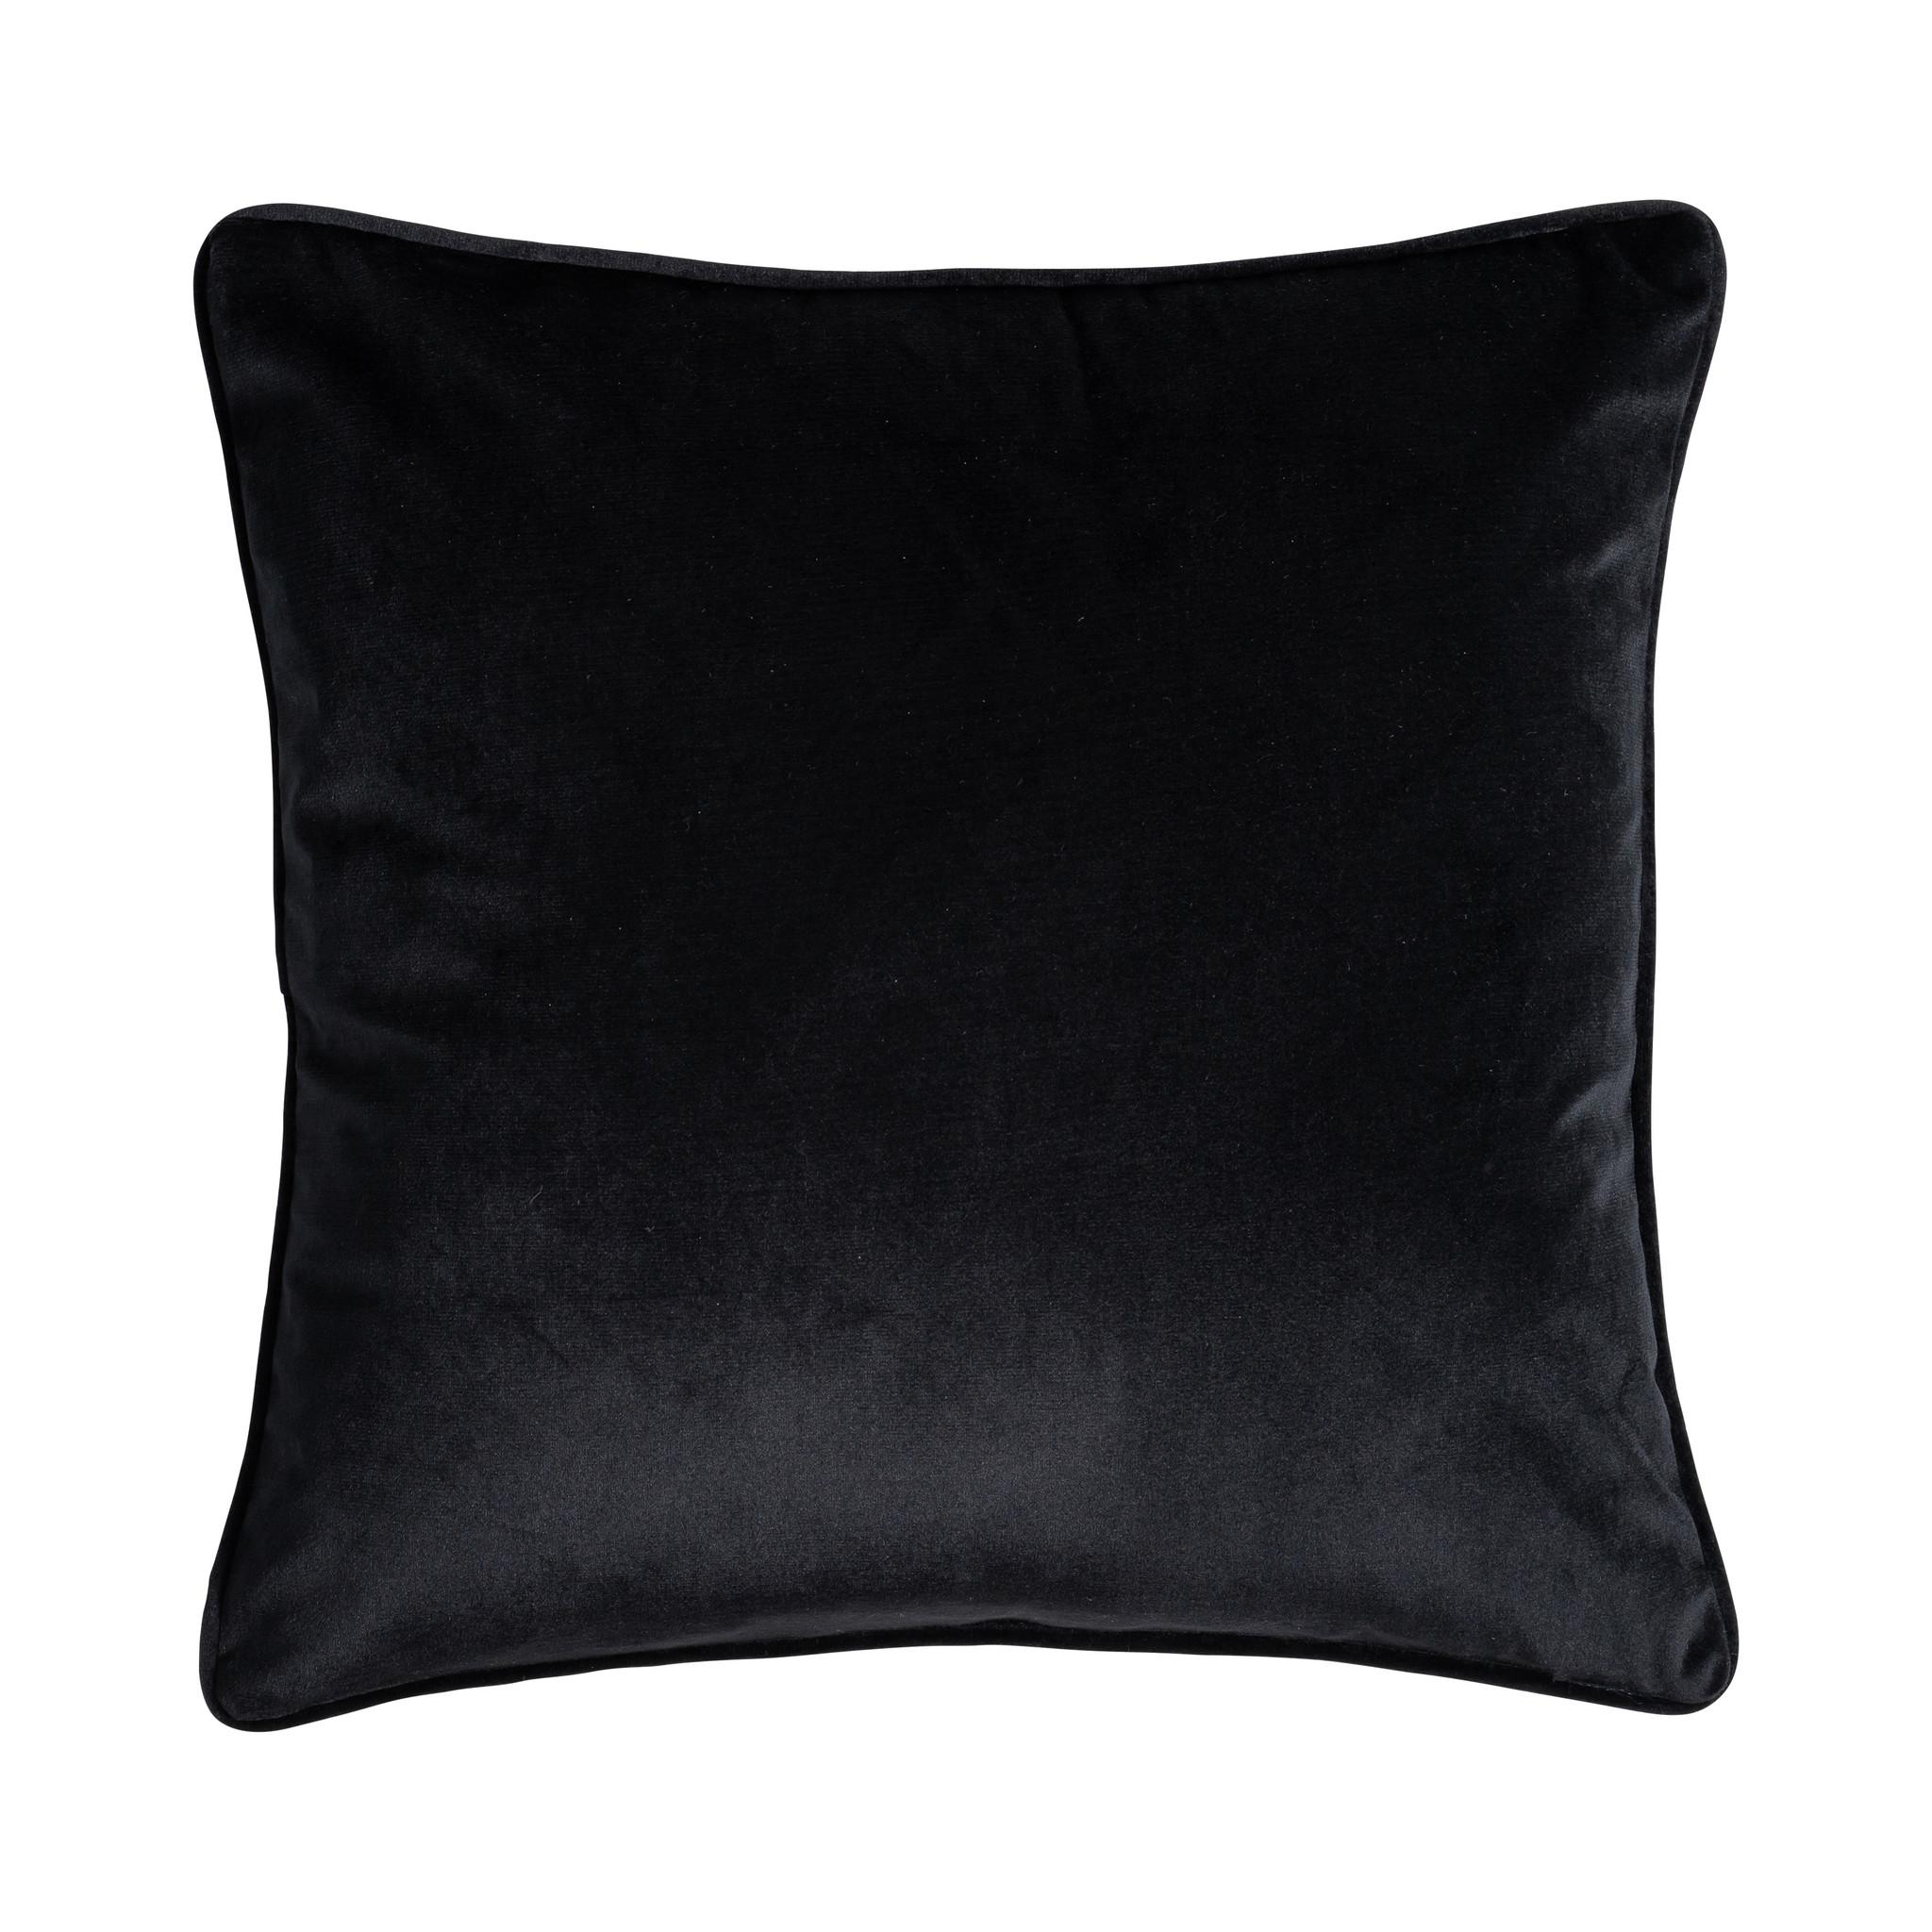 Presence Sierkussenhoes Black Velvet - Zilver Soort: Sierkussenhoes